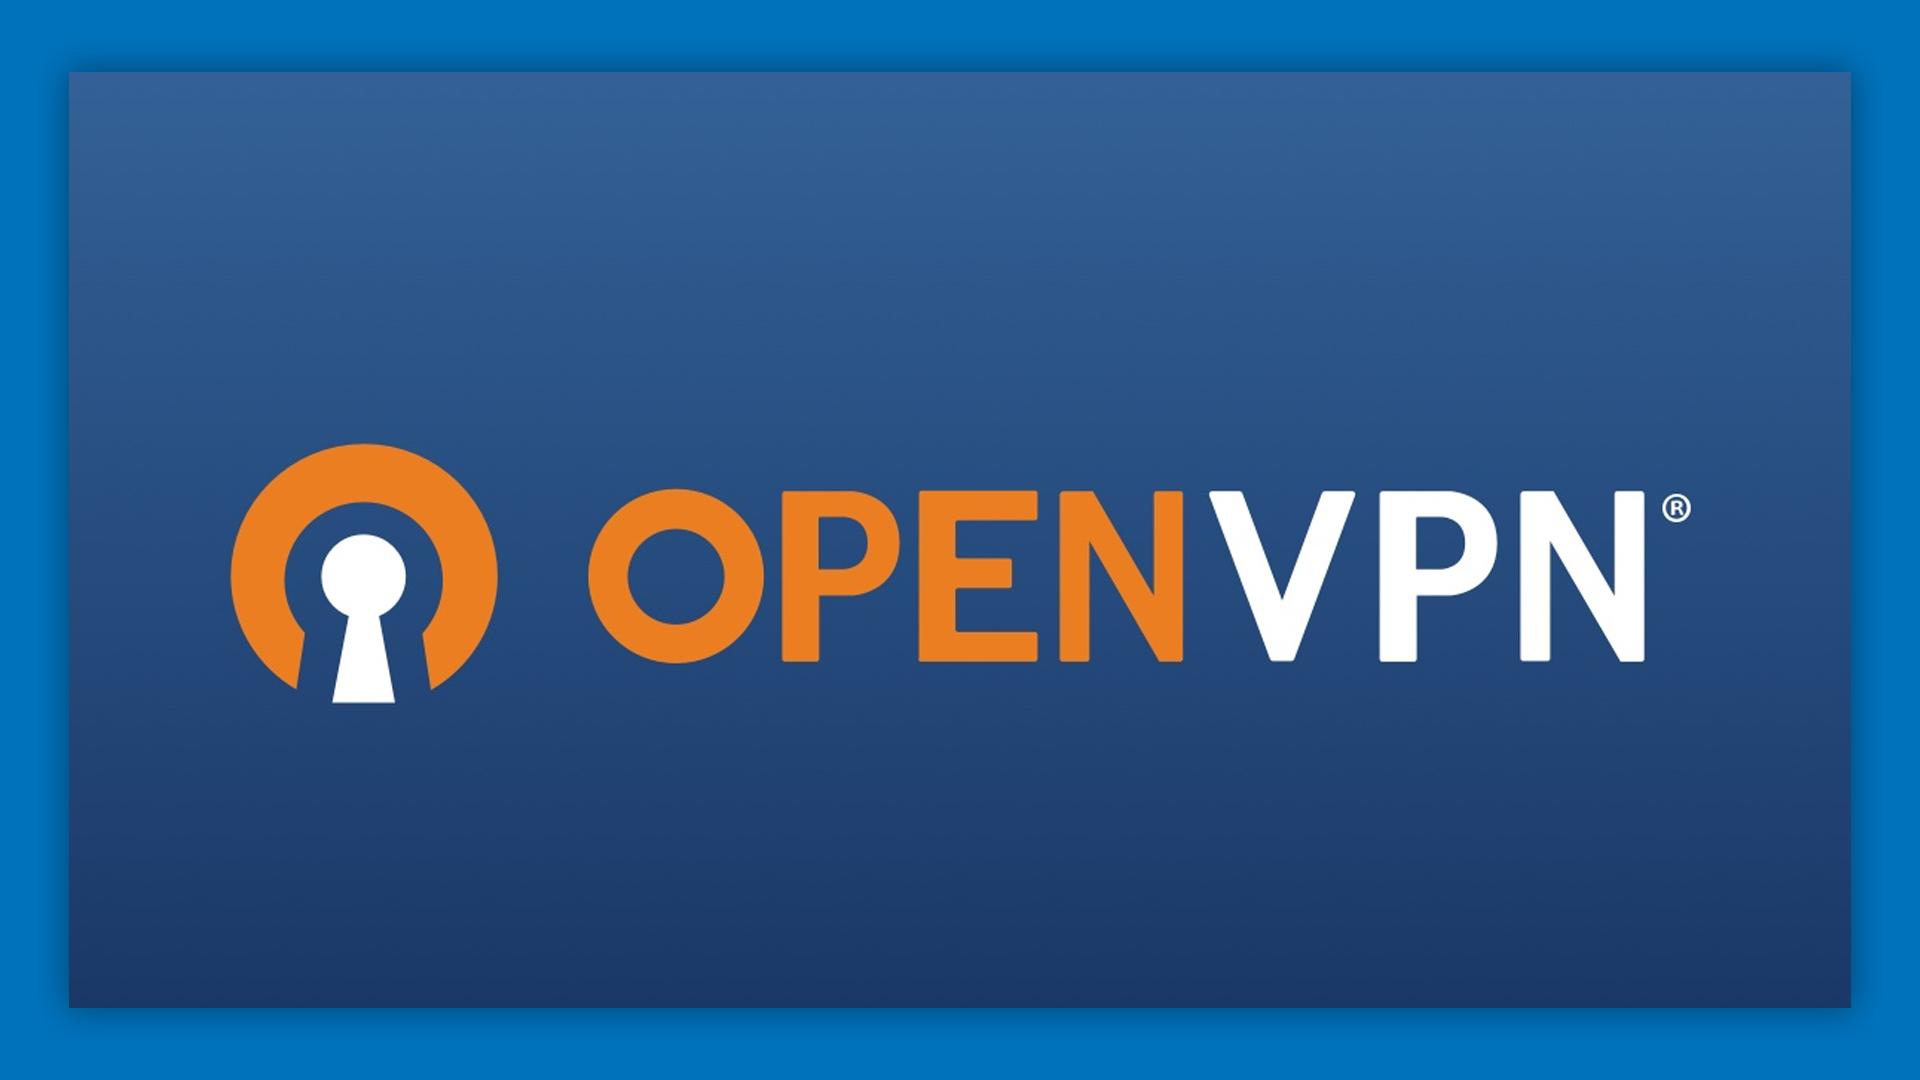 TOP10 VPN INBANGLADESH, বাংলাদেশের মধ্যে সেরা দশটি ভিপিএন